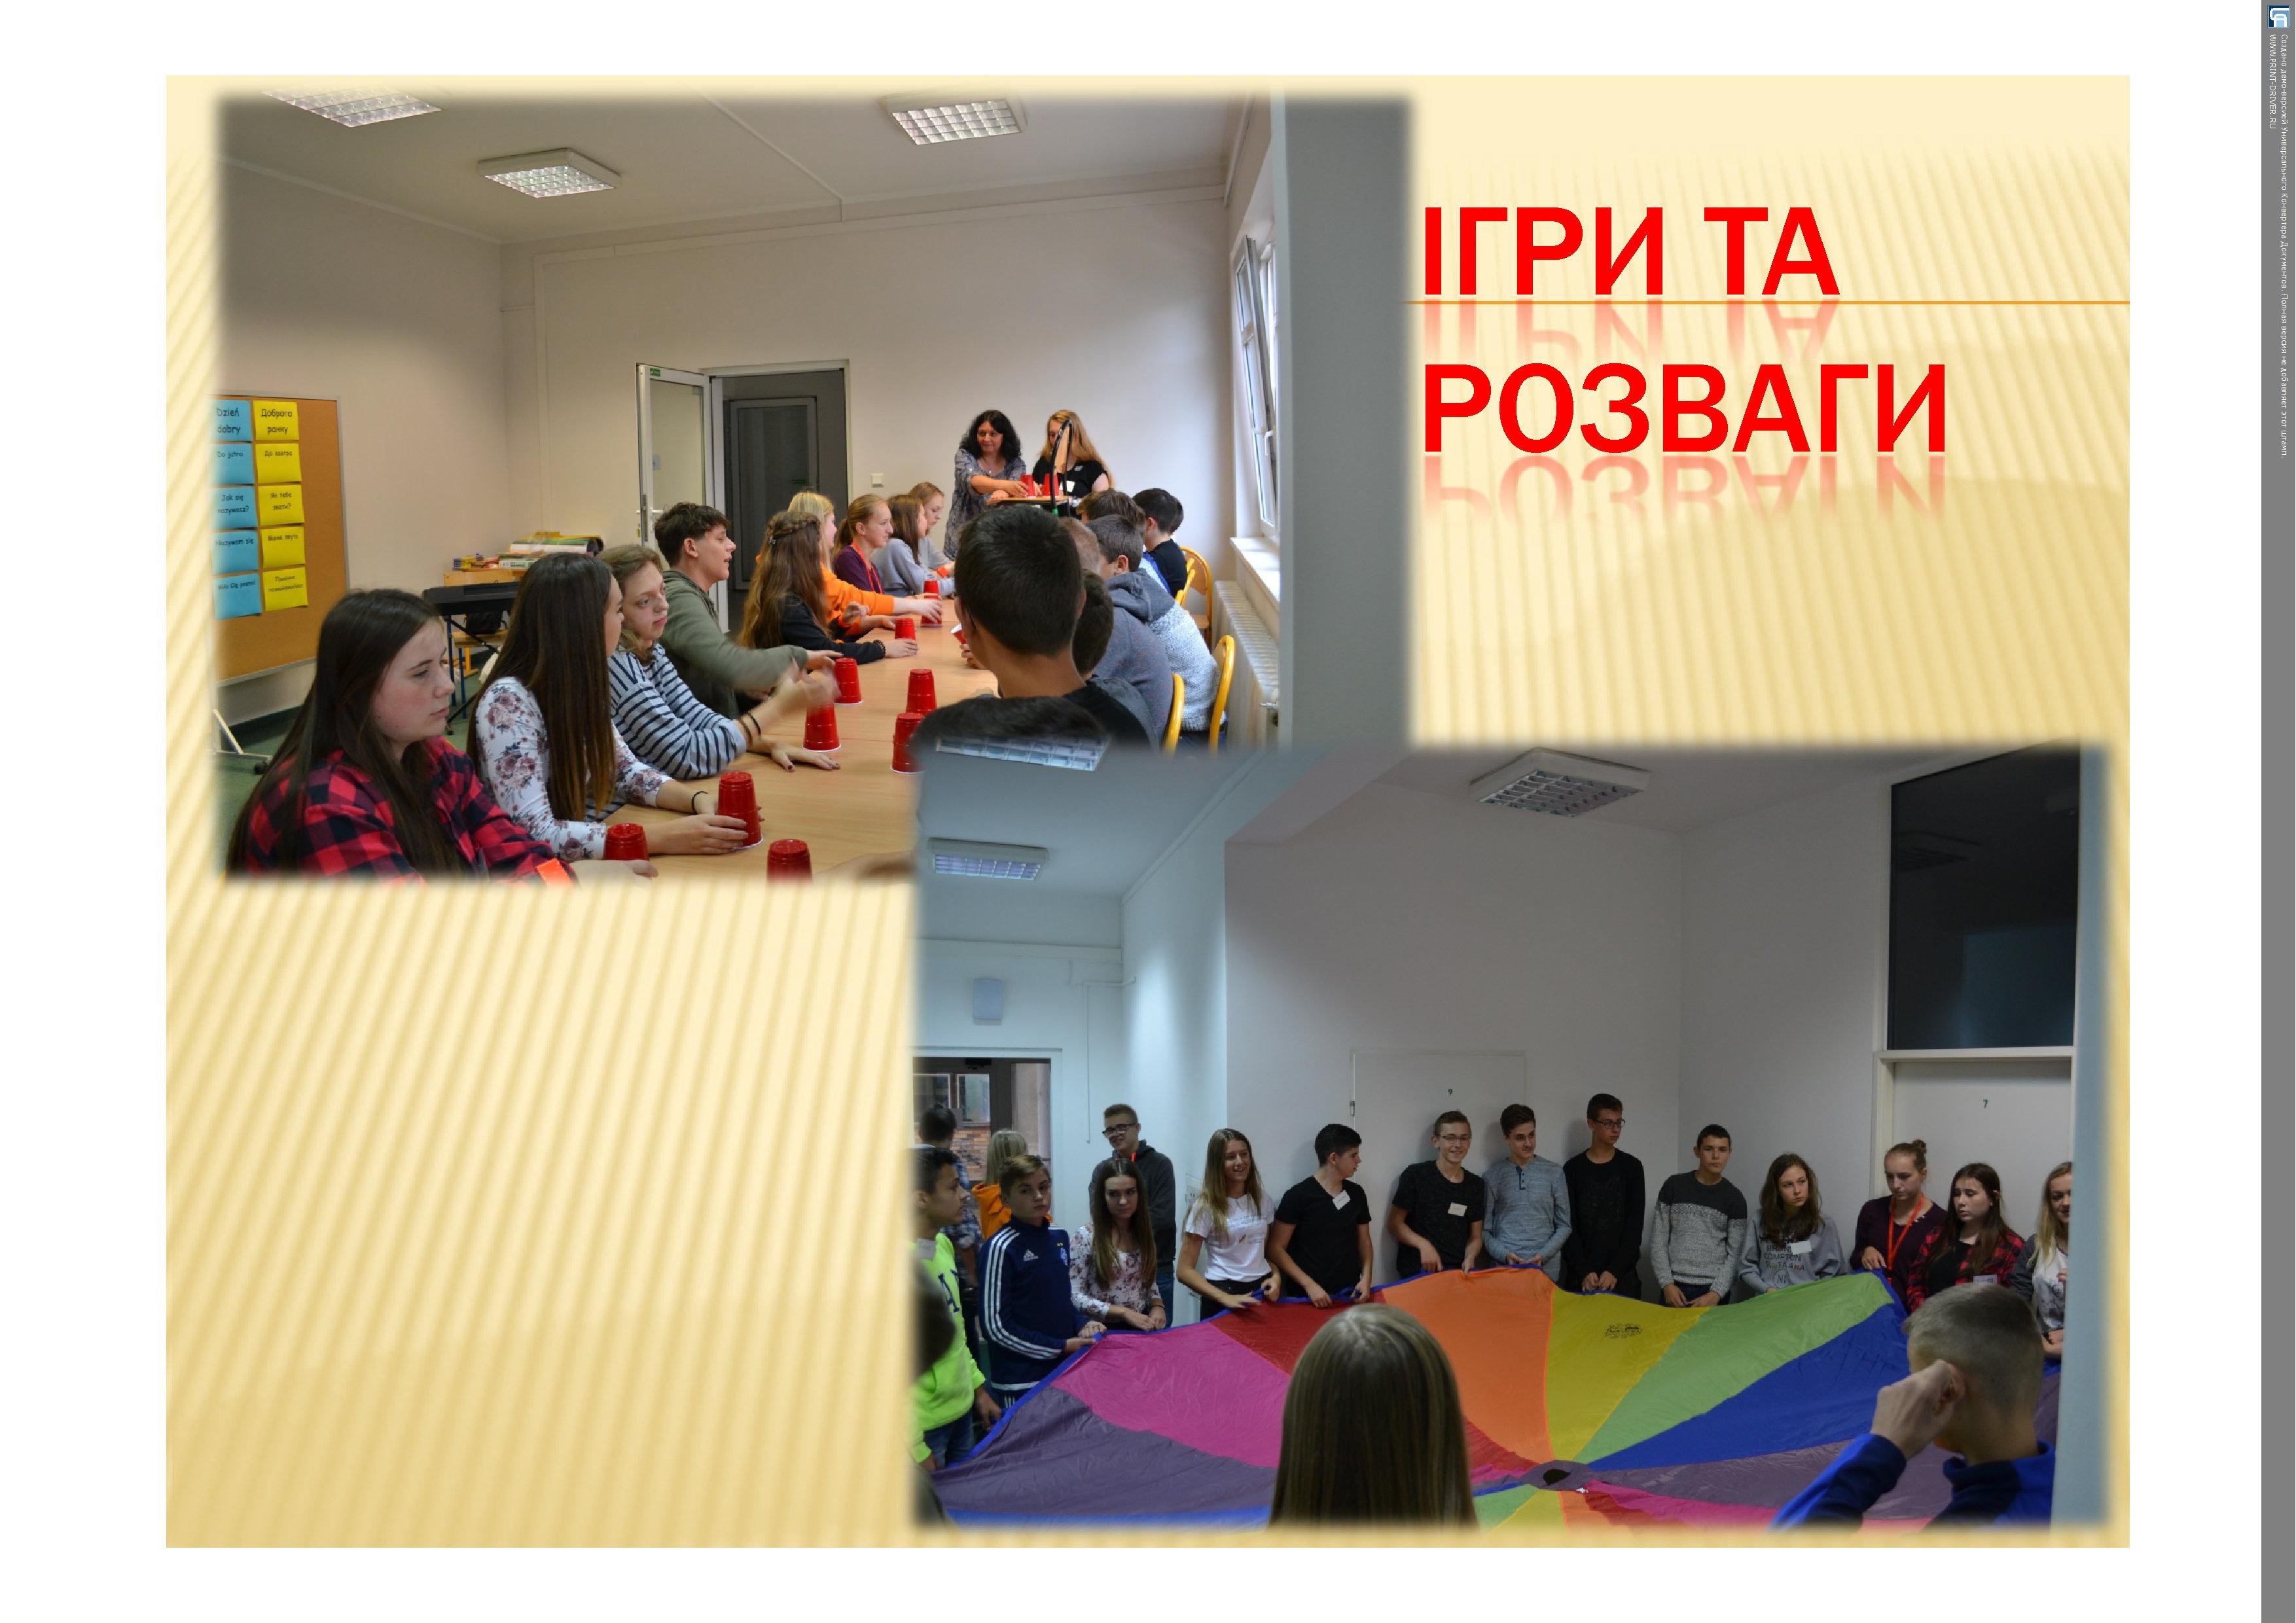 prezentacija-polshcha20-1